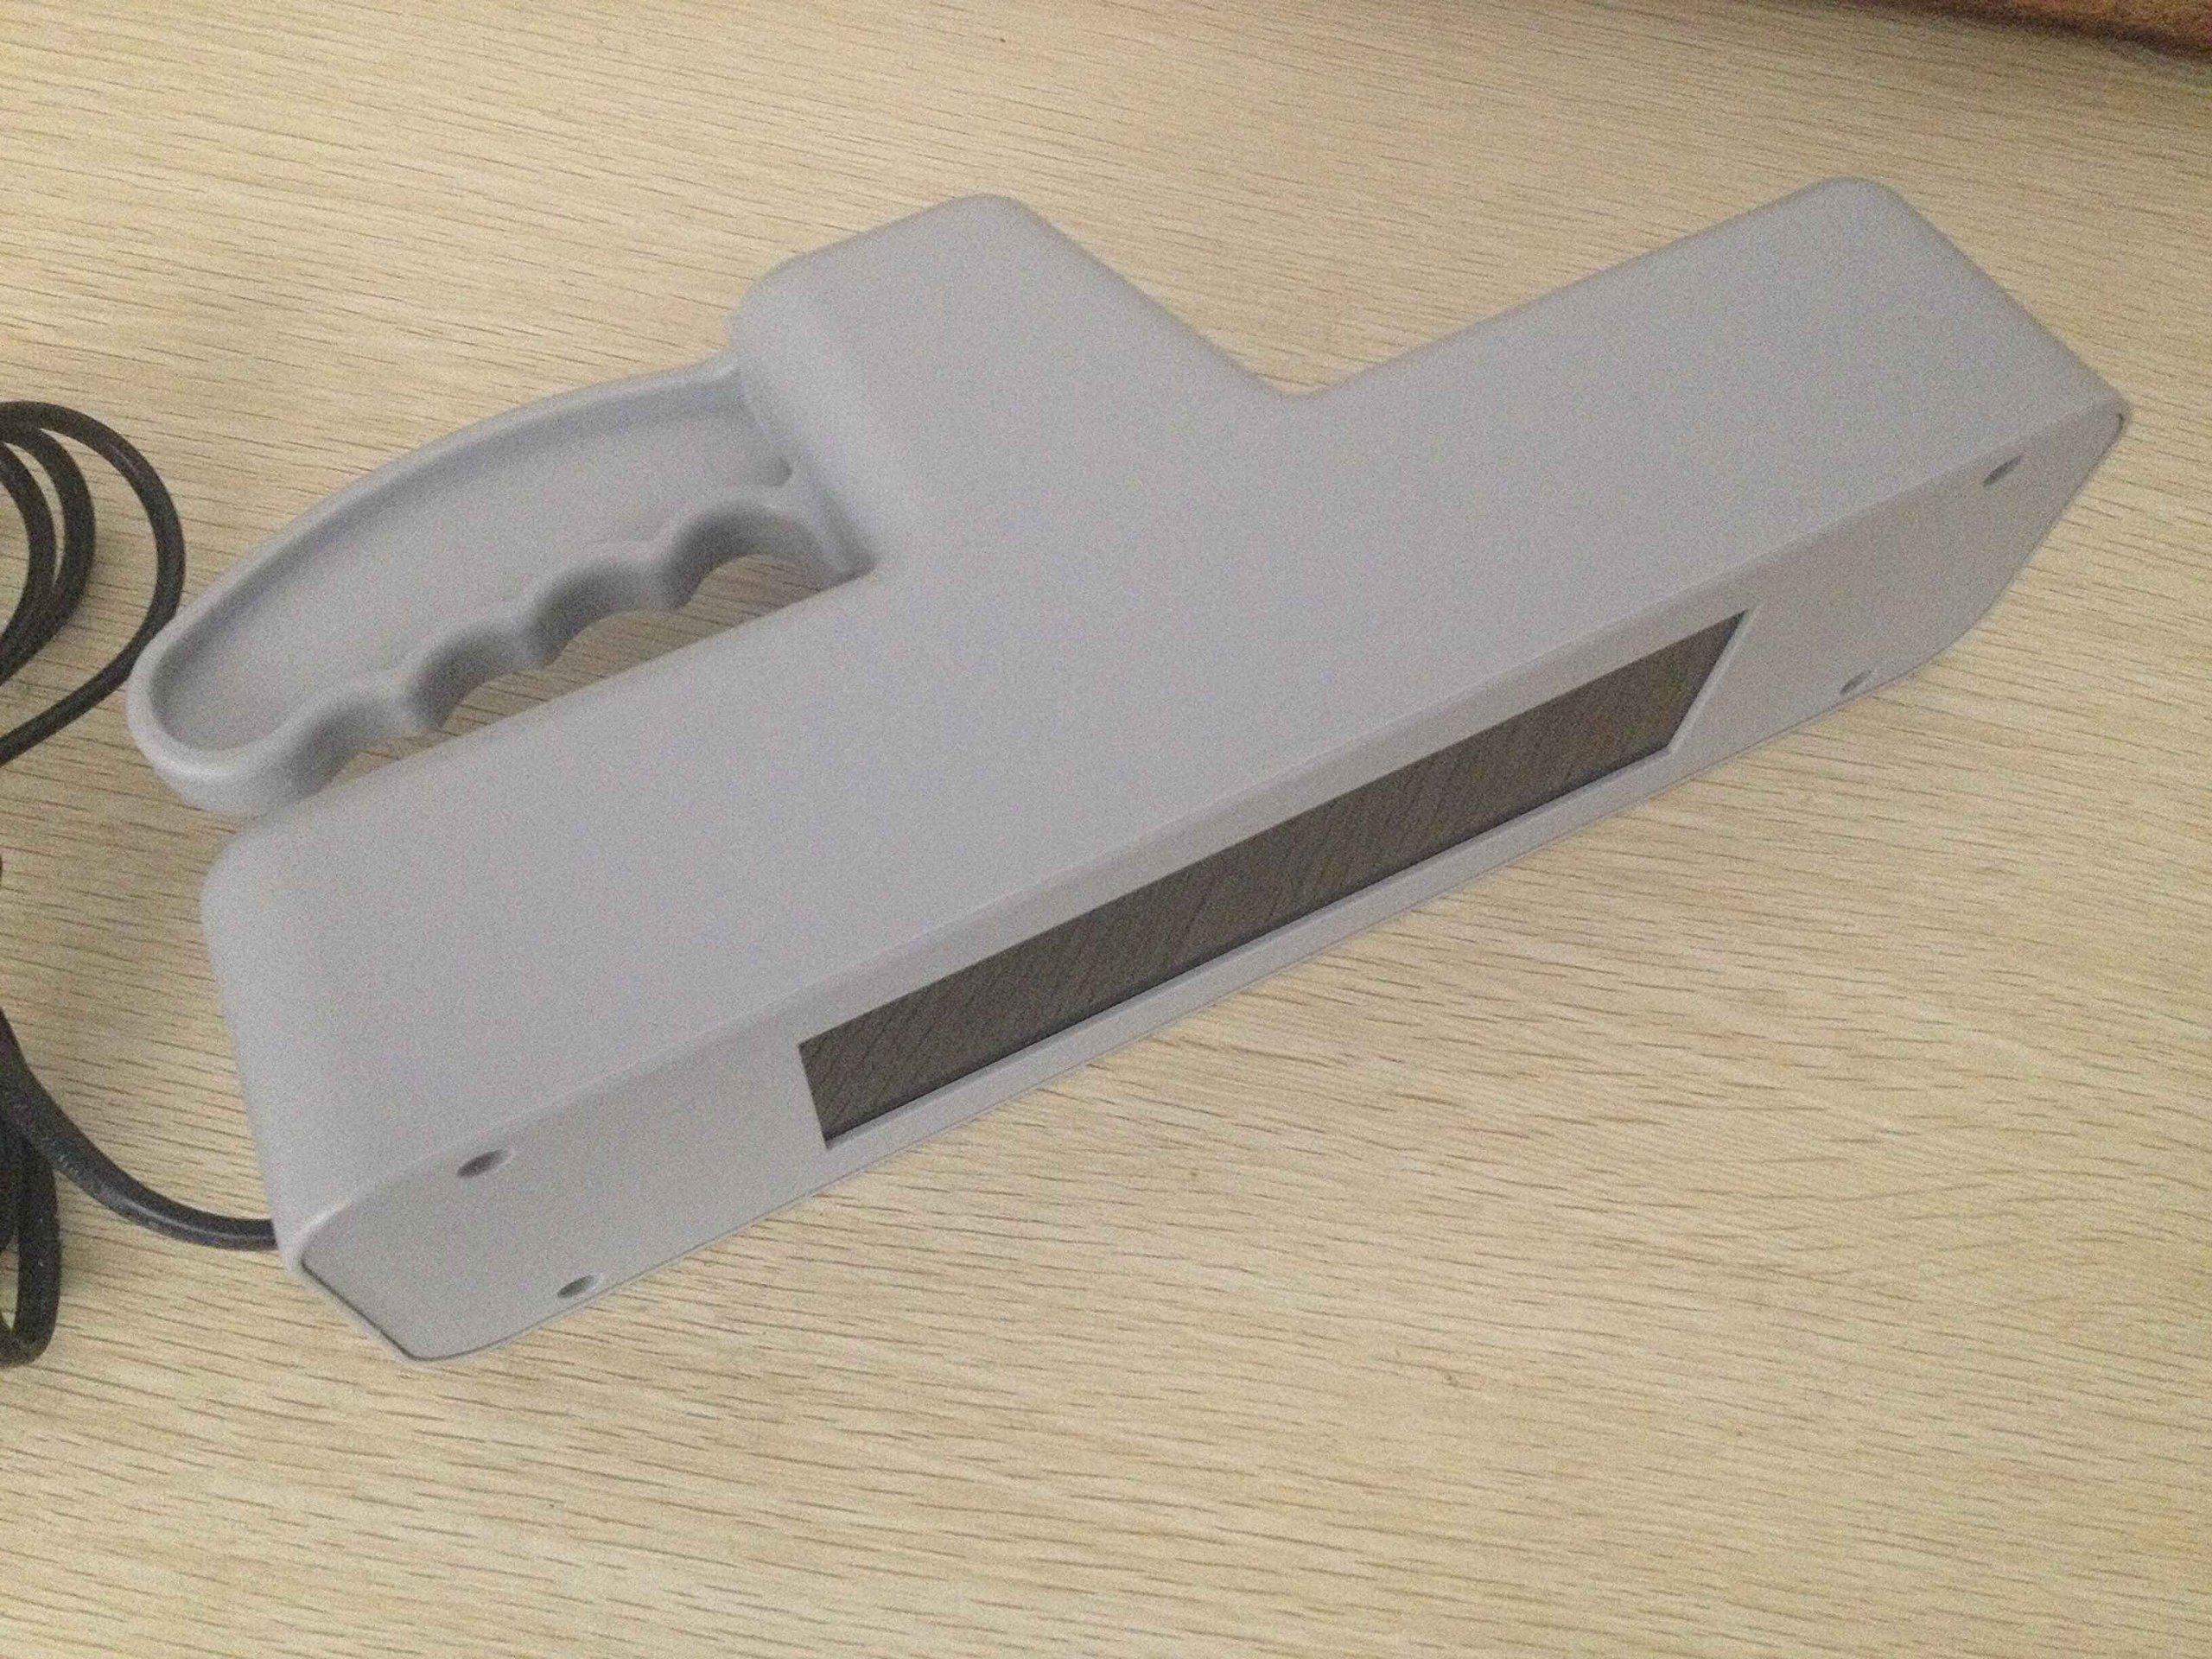 Brand new portable ultraviolet analyzer